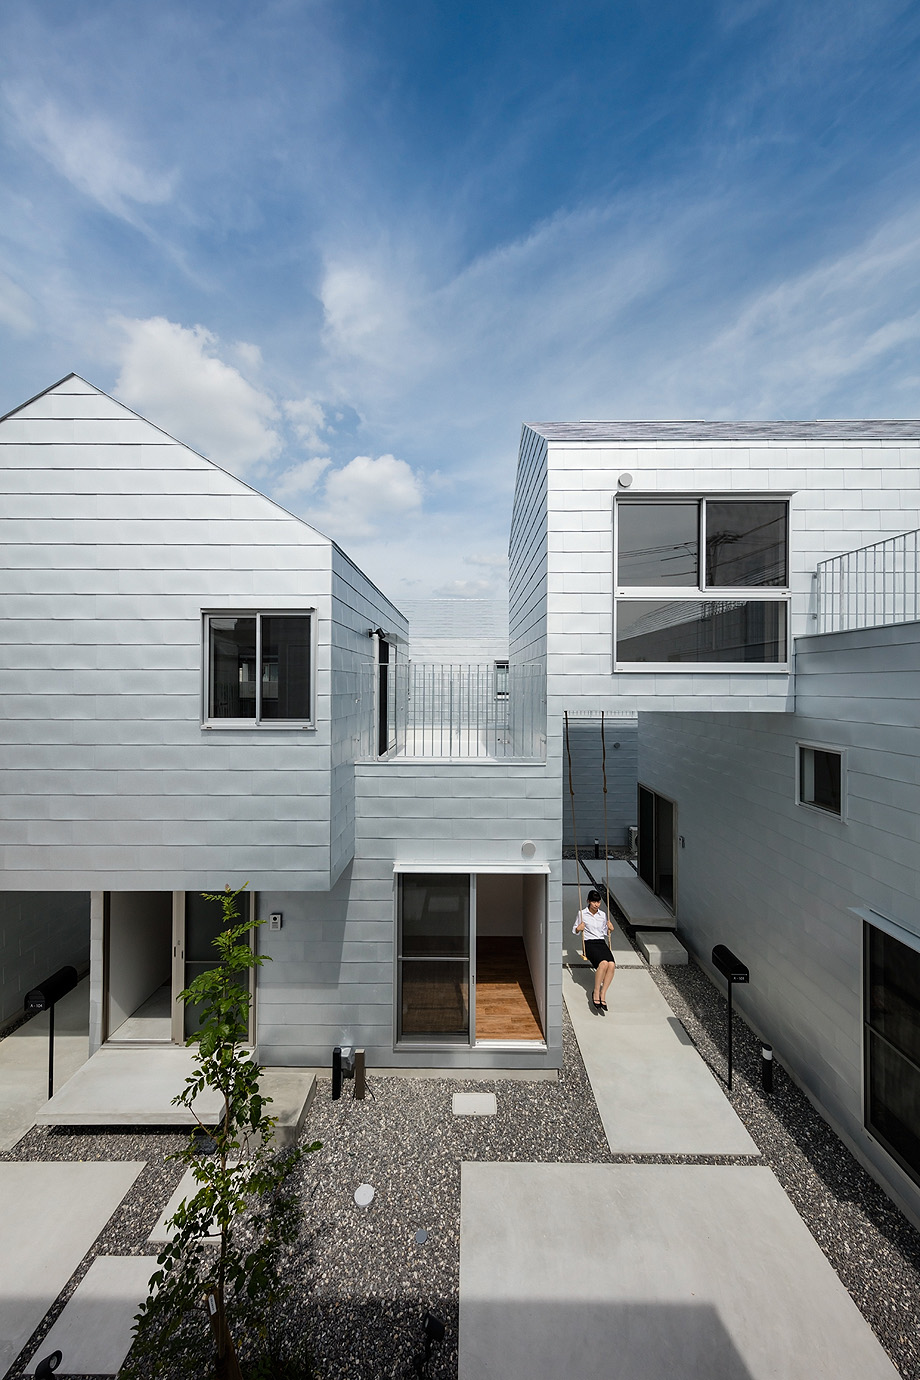 apartamentos de alquiler de masahiko fujimori - foto shigeo owaga (3)